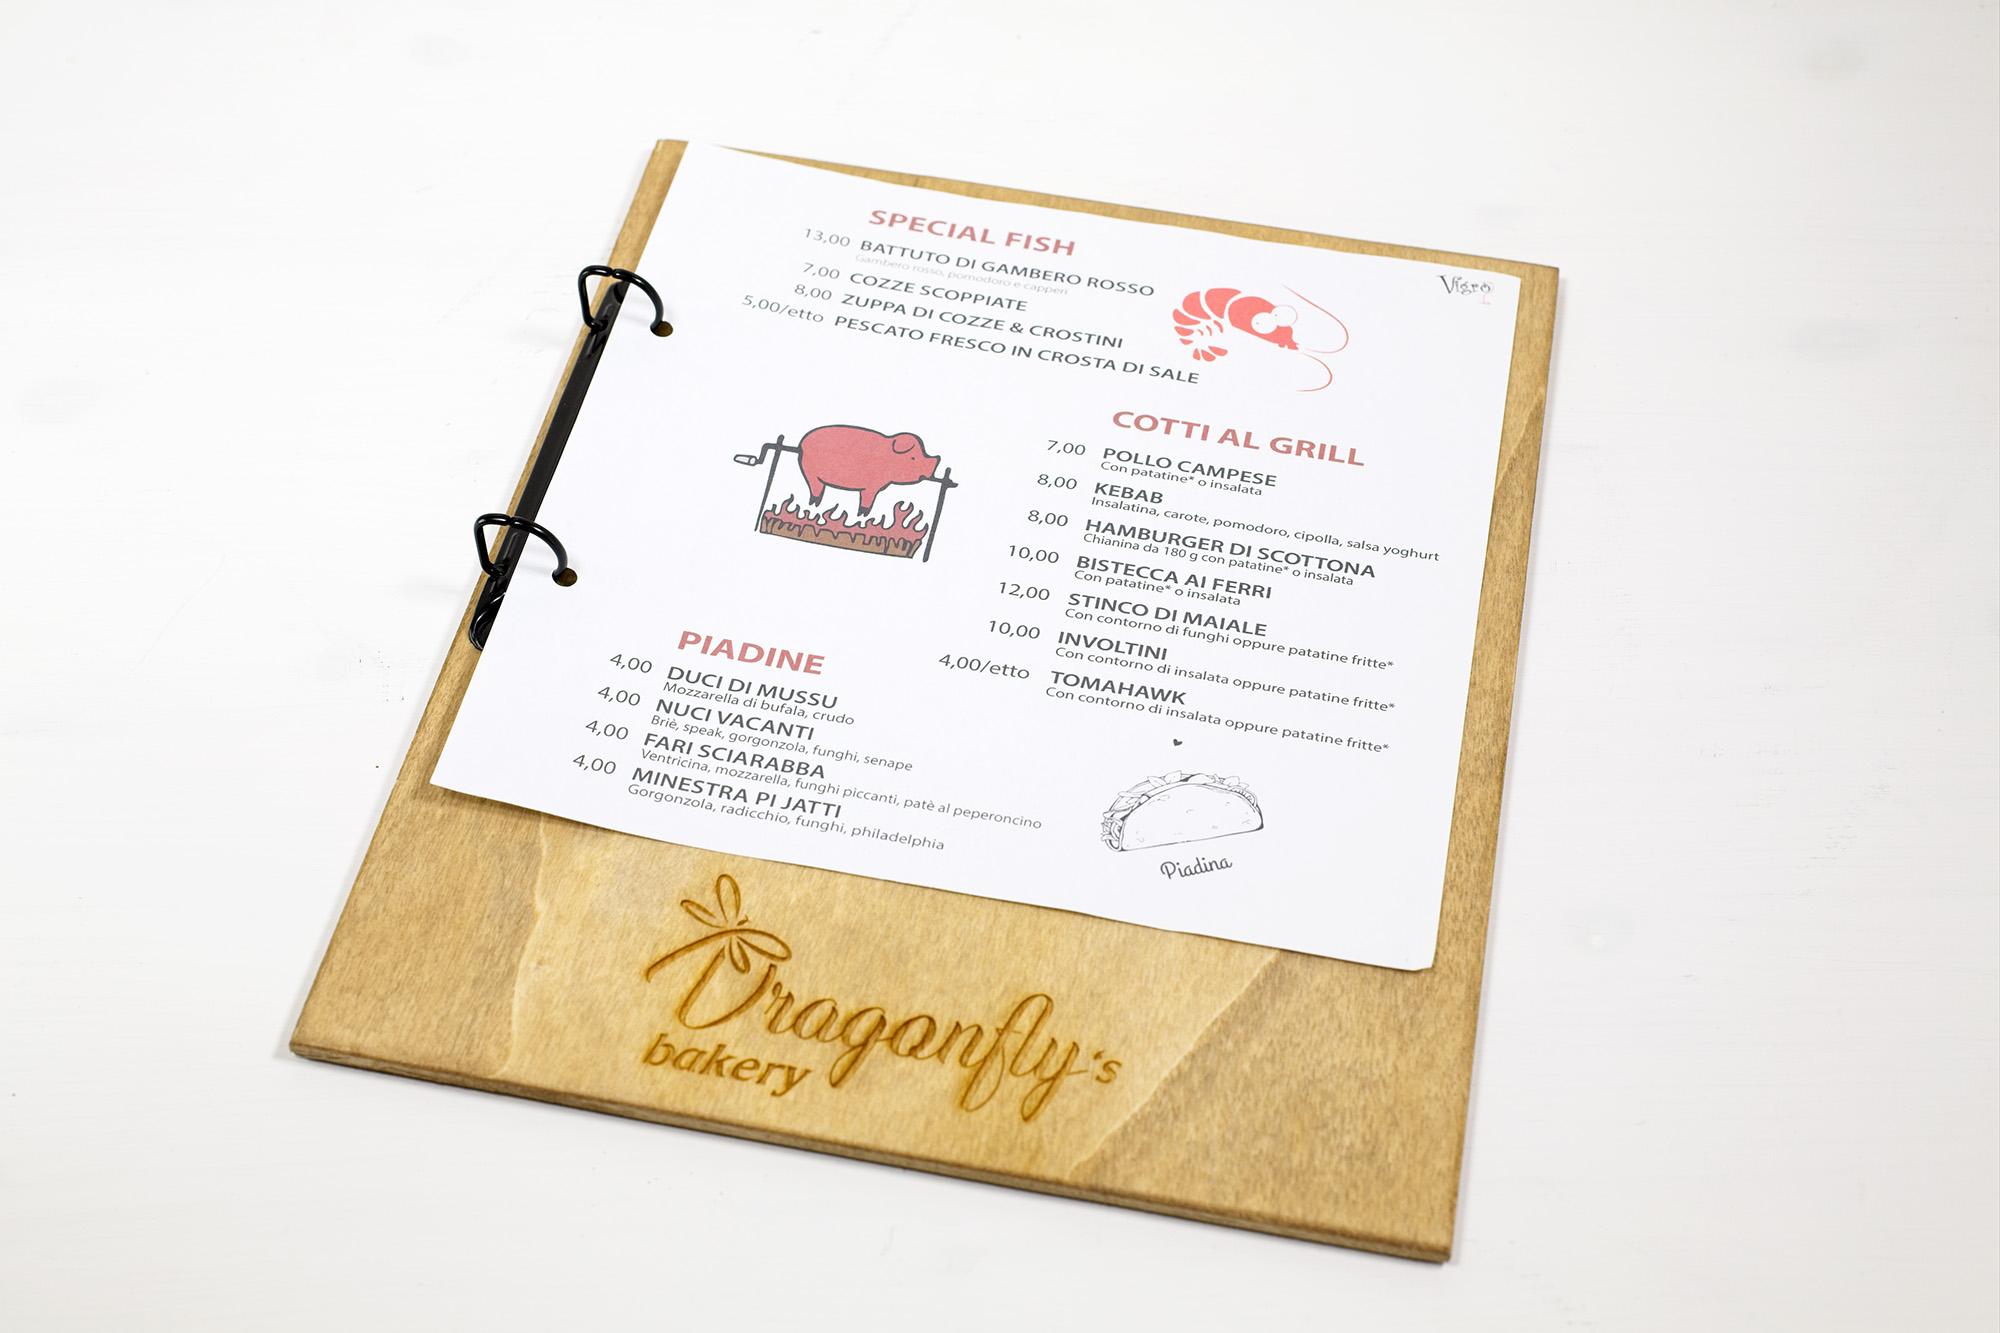 Portamenu Casteldaccia Dragonfly's